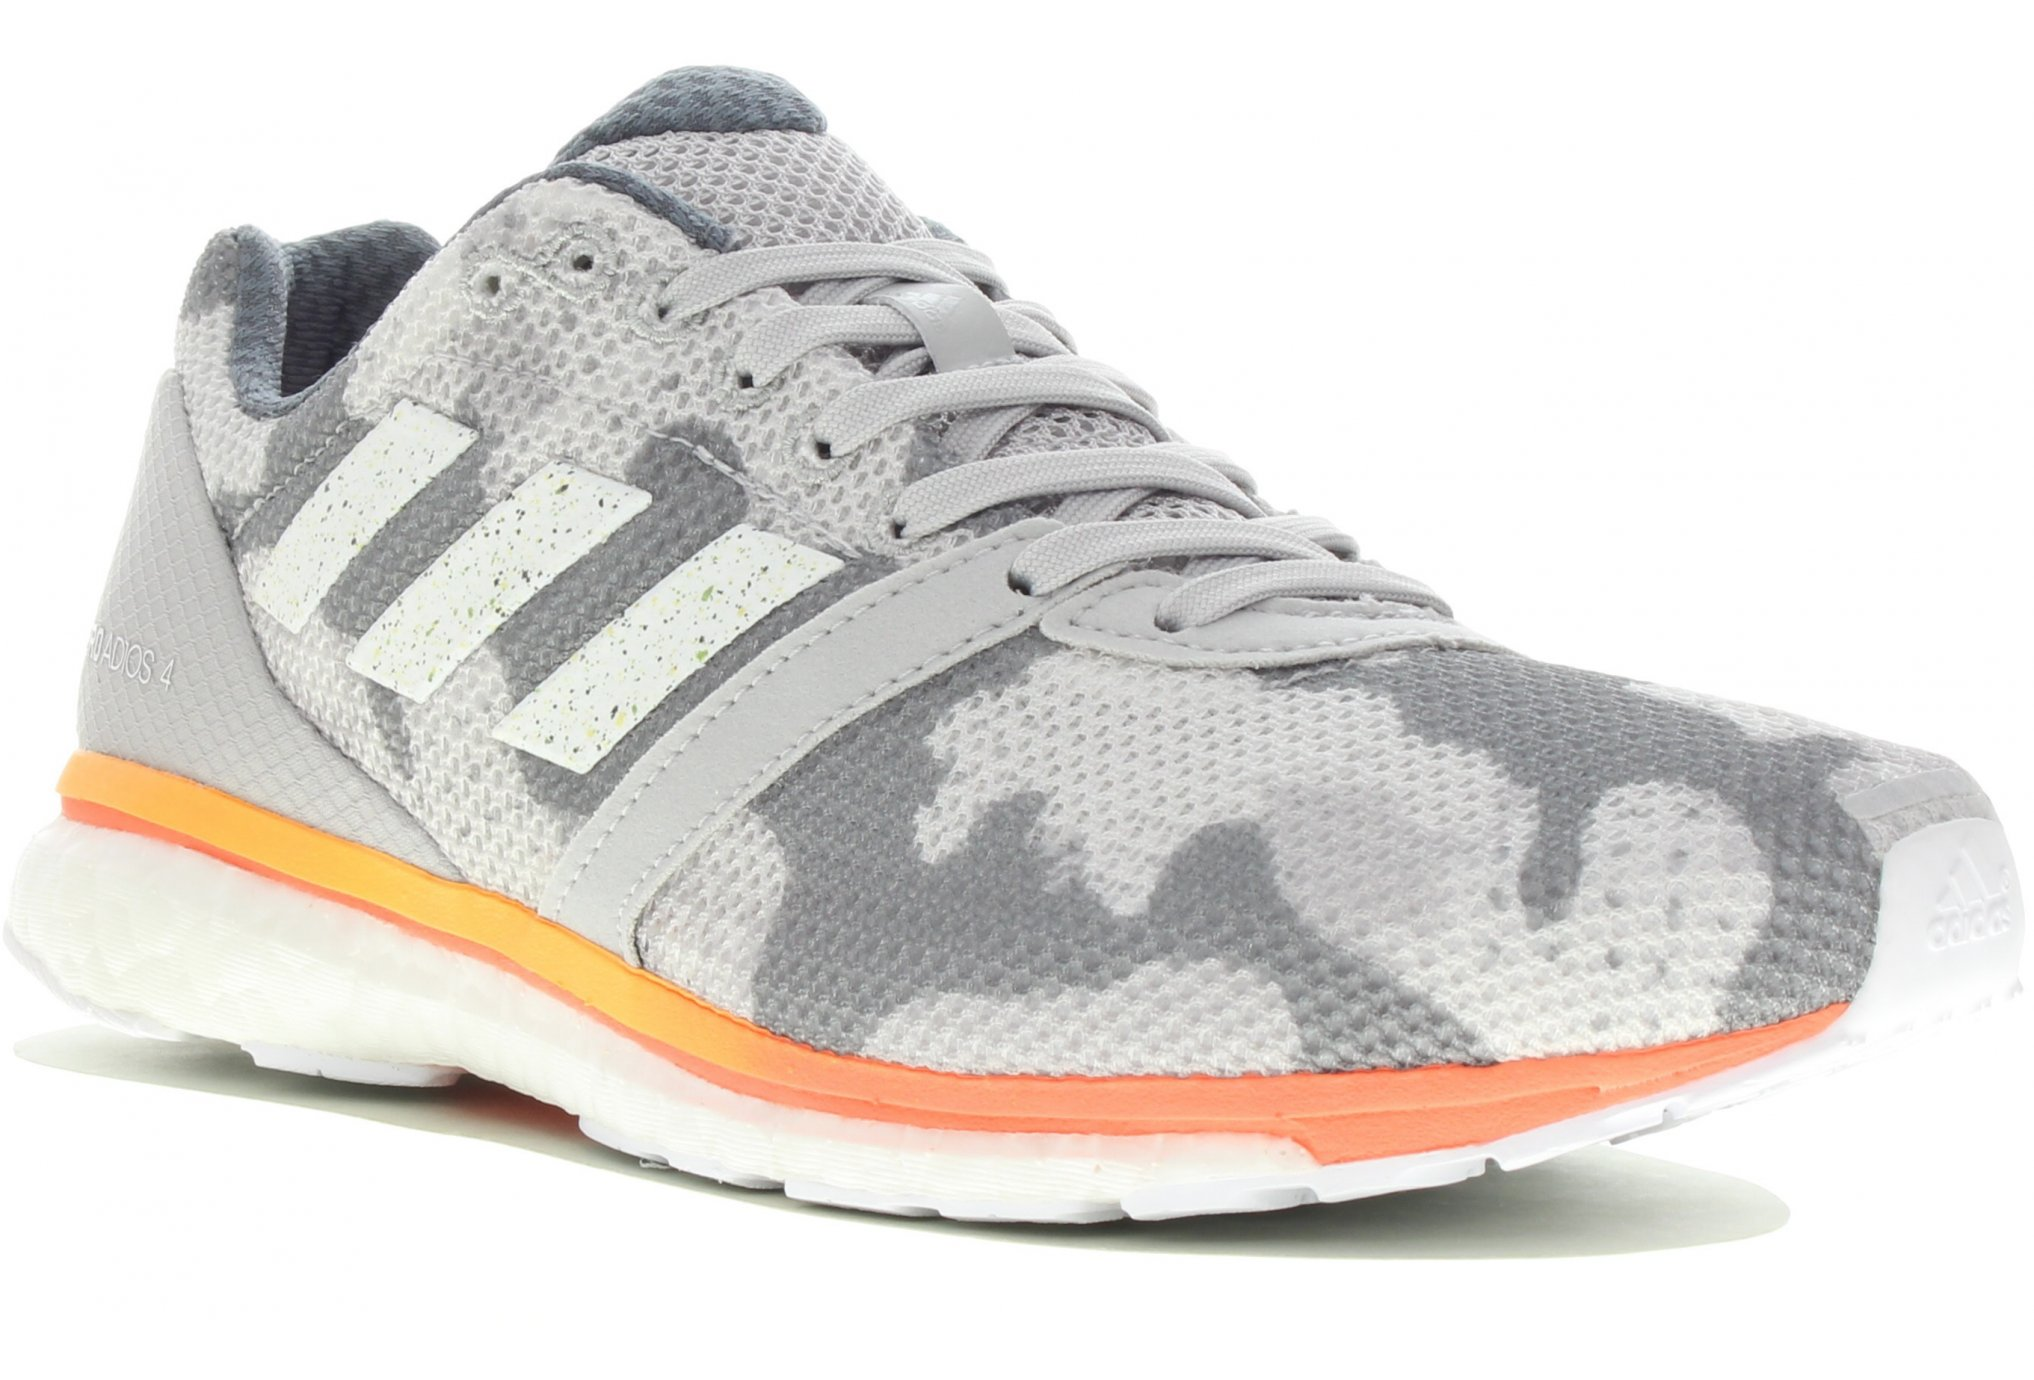 adidas adizero adios Boost 4 Chaussures running femme